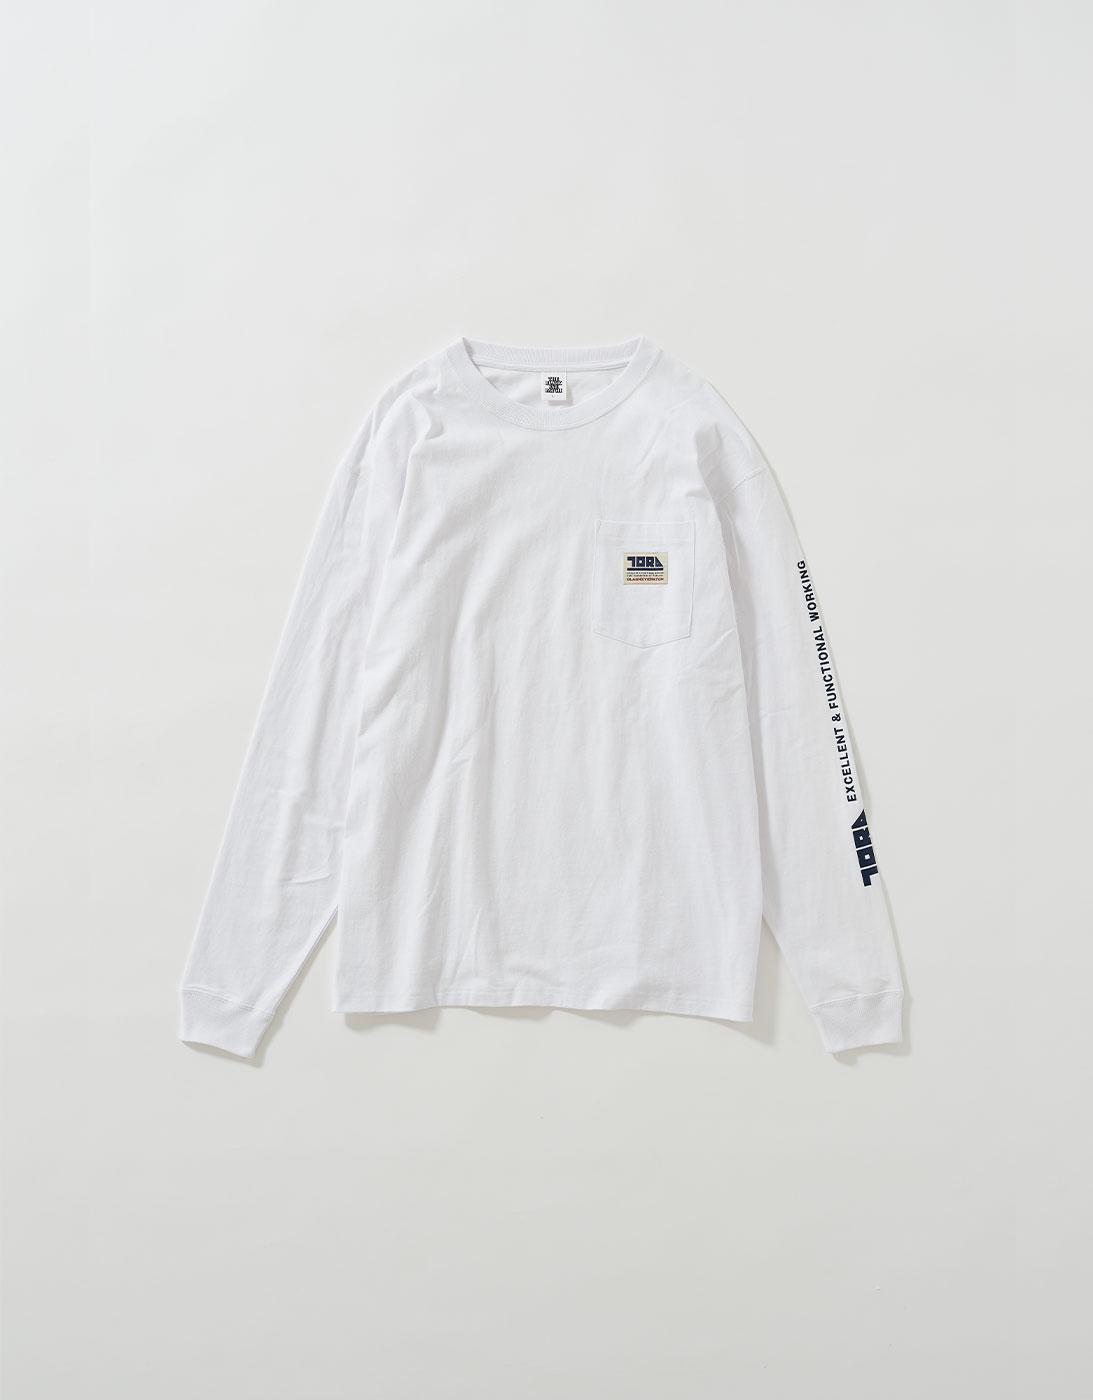 TORAICHI POCKET L/S TEE 1811-617 OFF WHITE (BlackEyePatch & TORAICHI Collaboration)